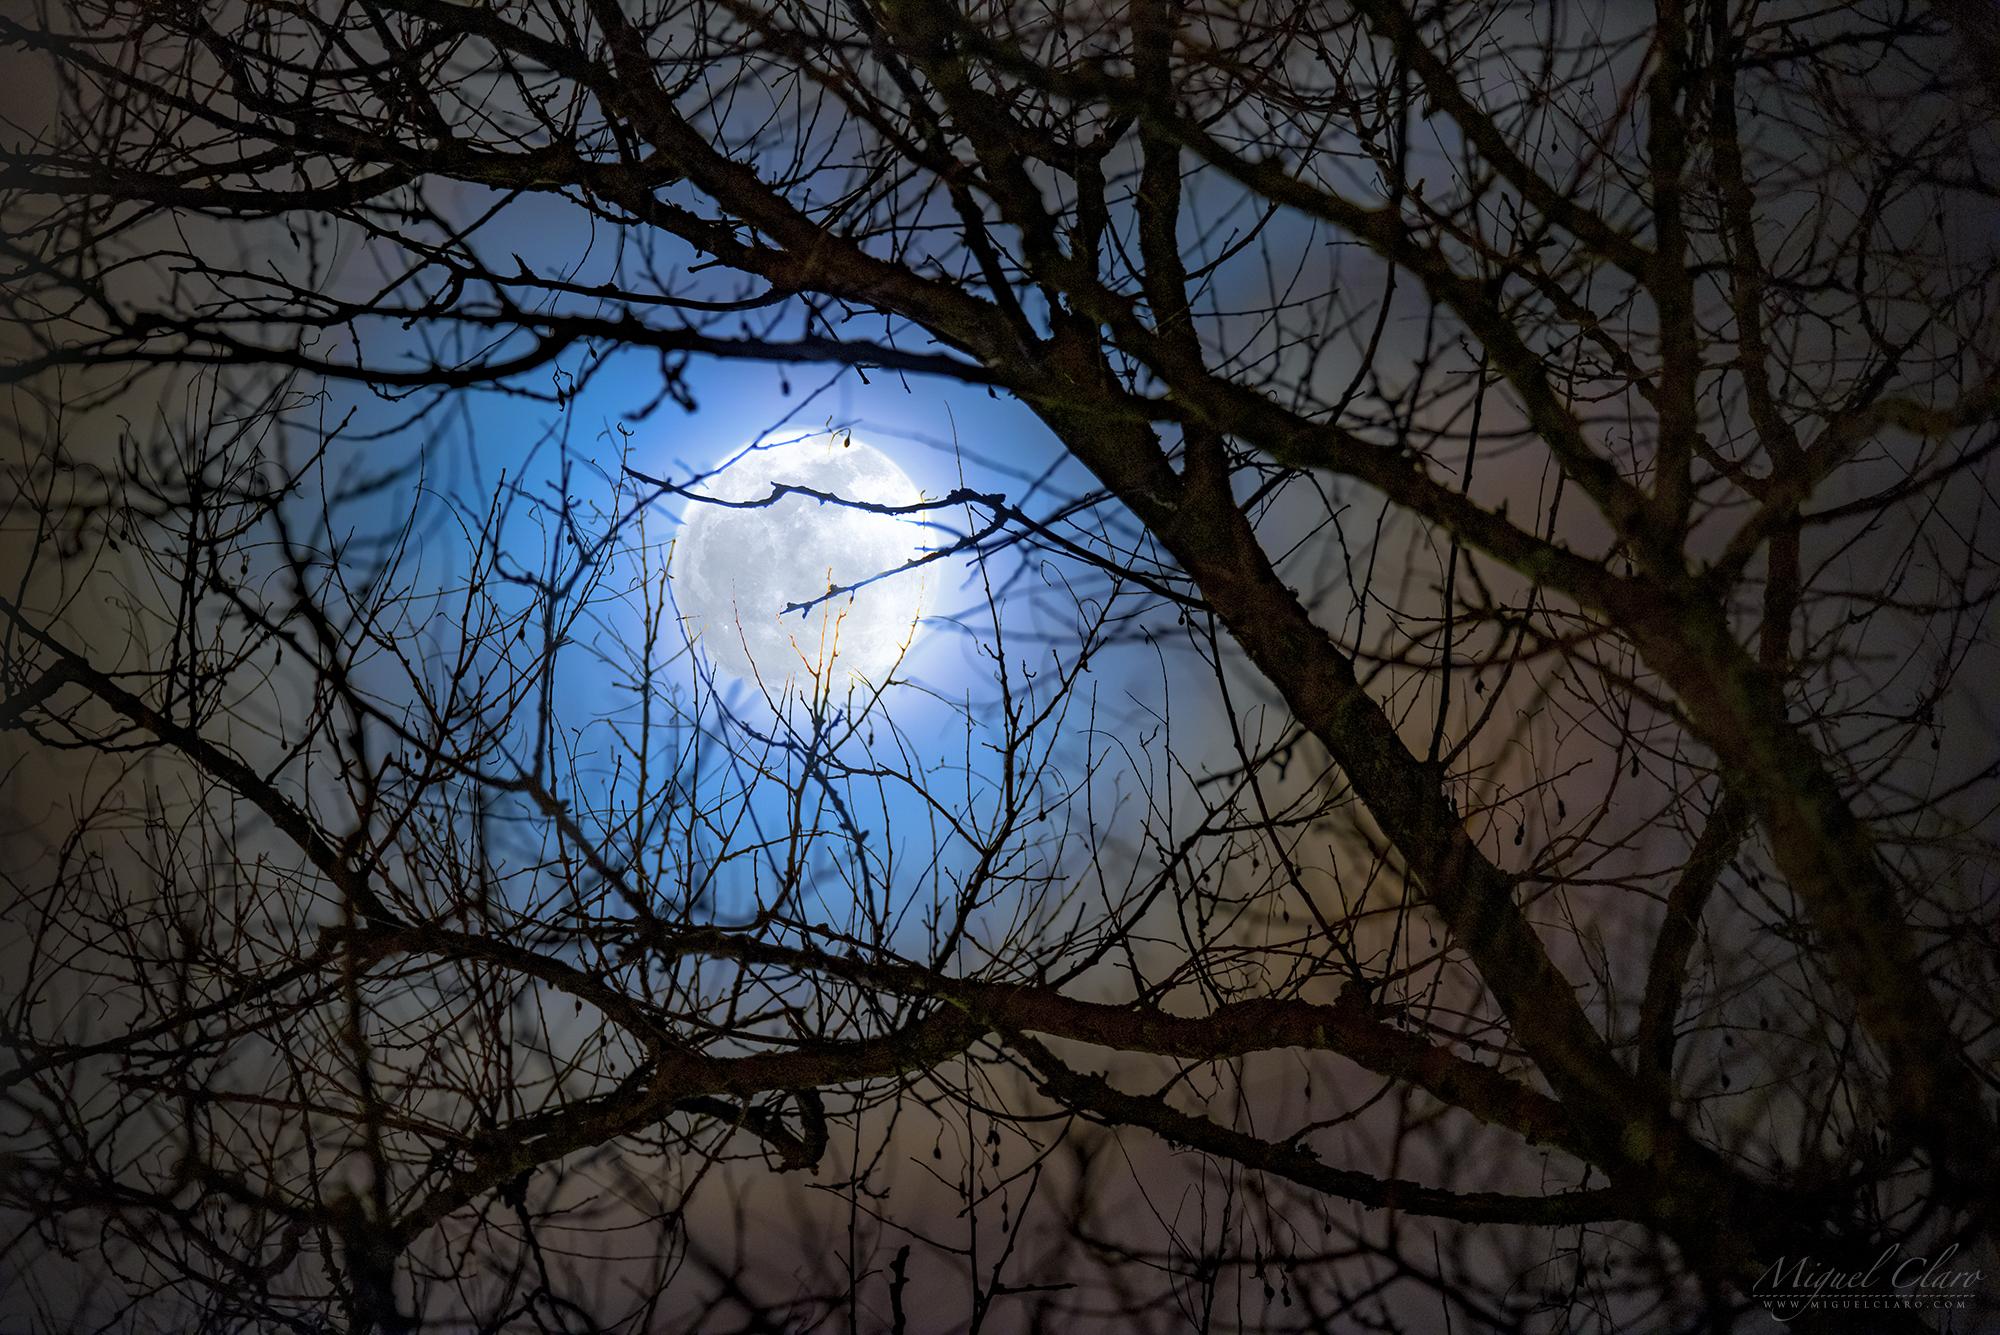 Blue 'Lunar Corona' Frames the Full Moon in Eerie Night-Sky Photo